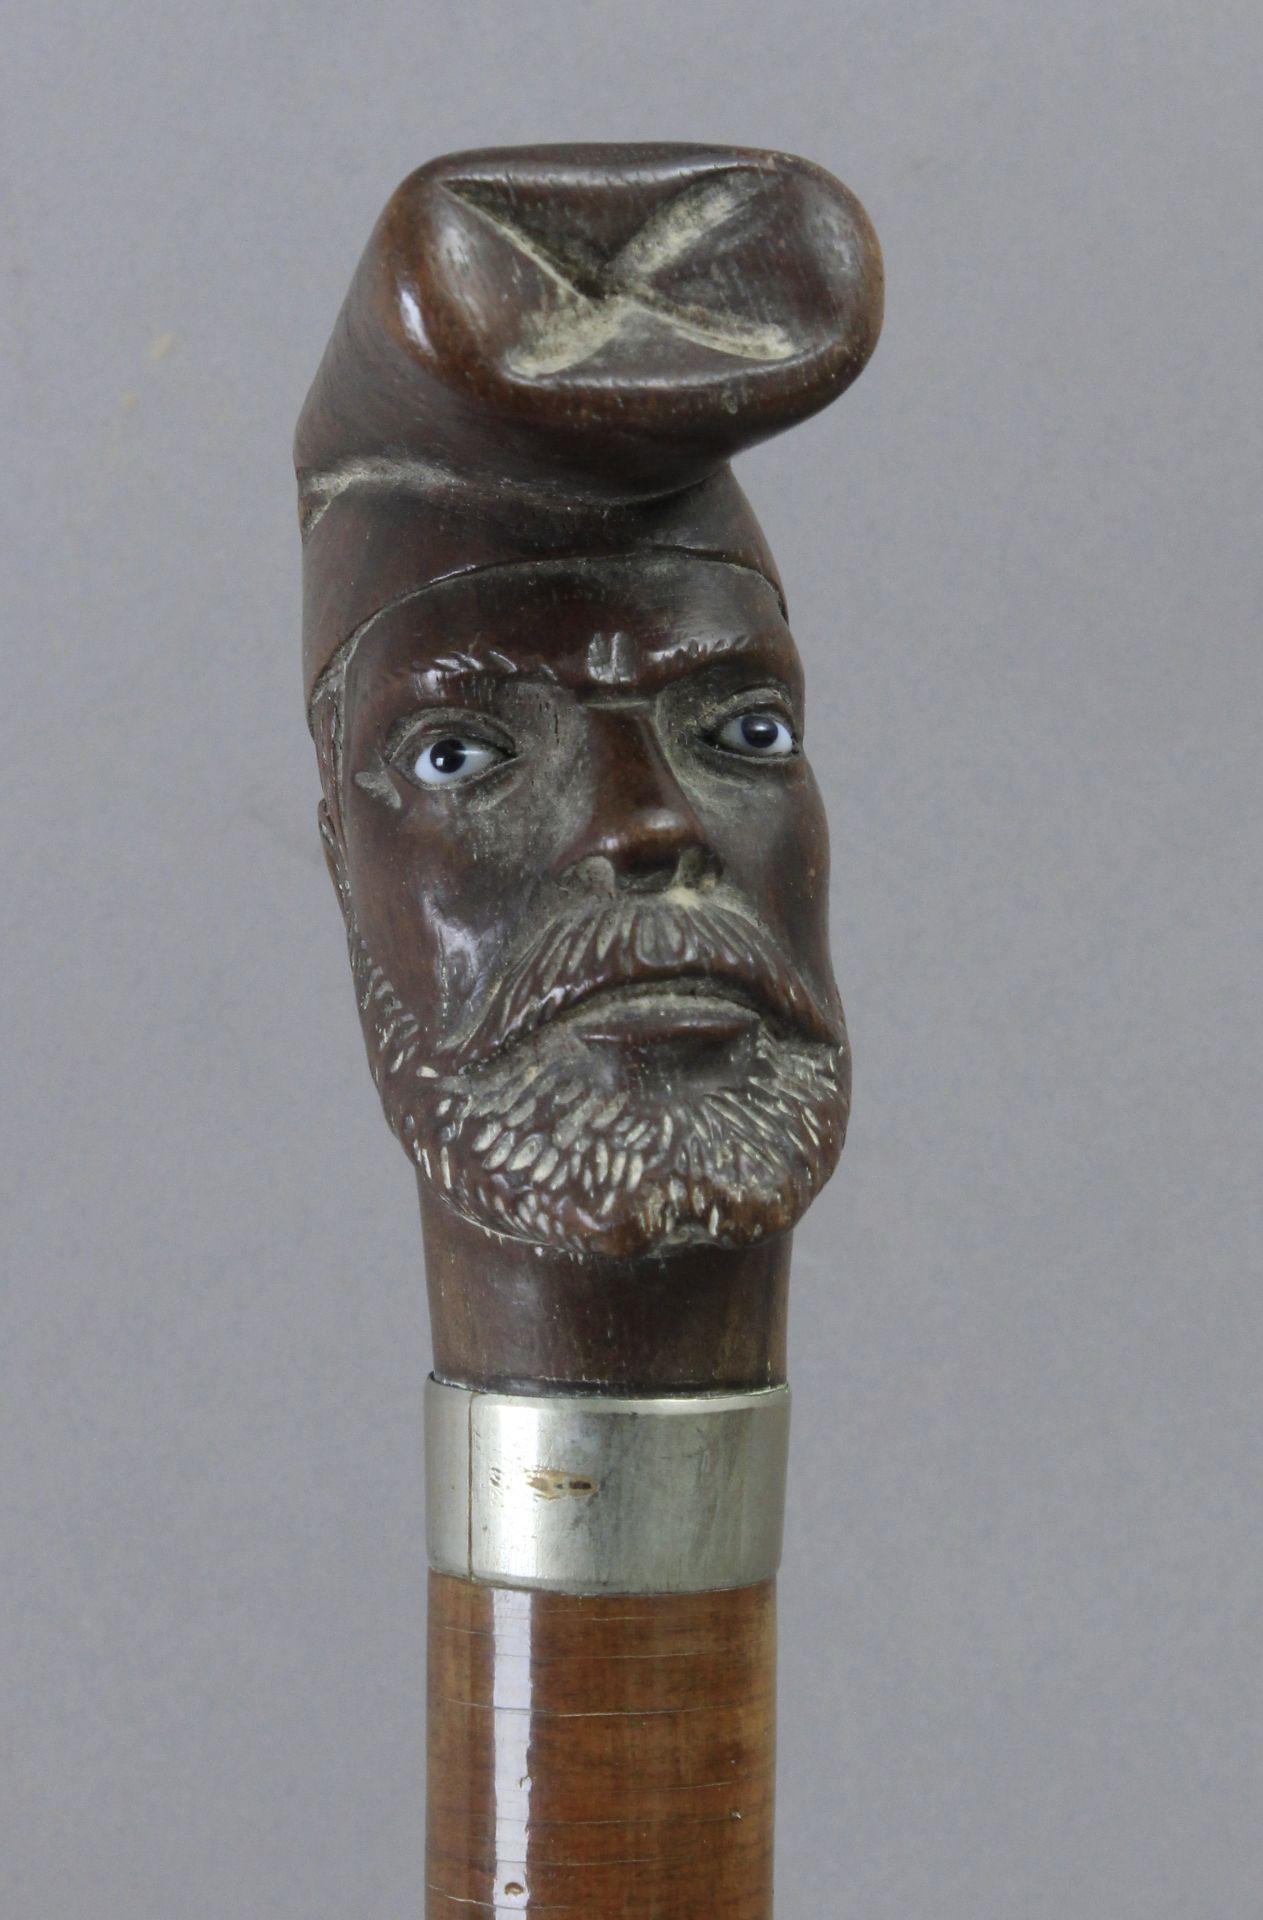 A late 19th century walking stick - Bild 3 aus 3